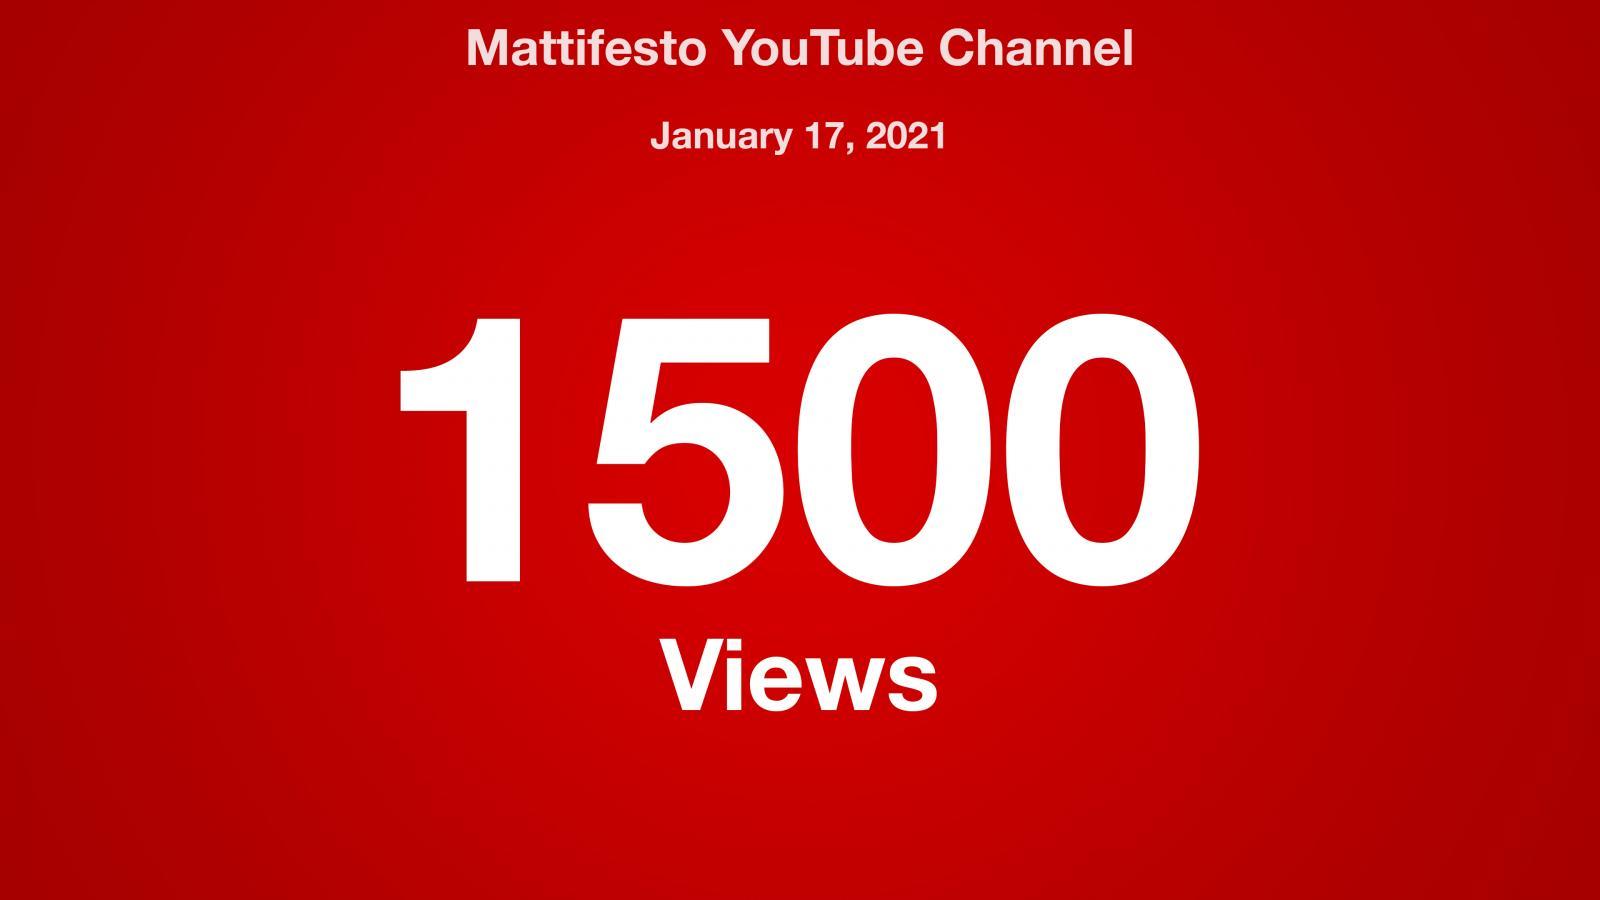 Mattifesto YouTube Channel, January 17, 2021, 1500 Views